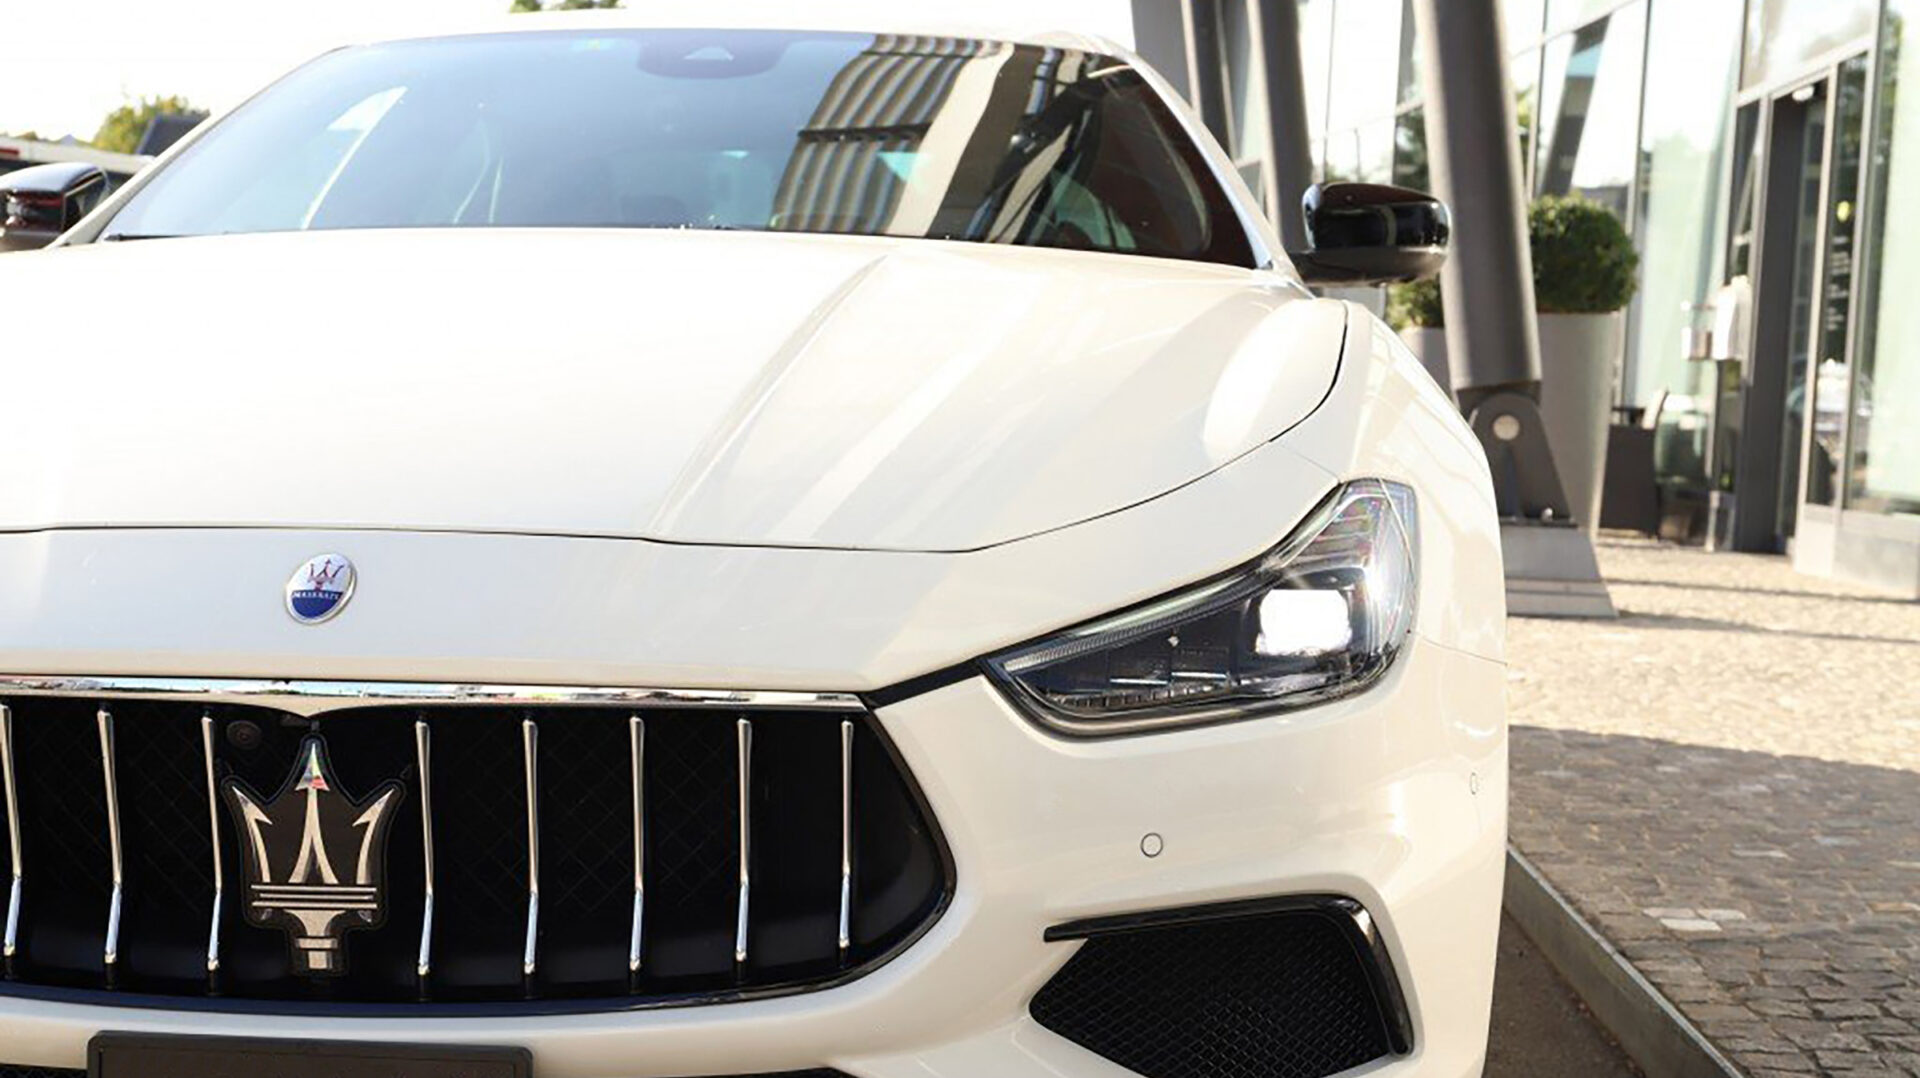 A2018 Maserati Ghibli Front Bn